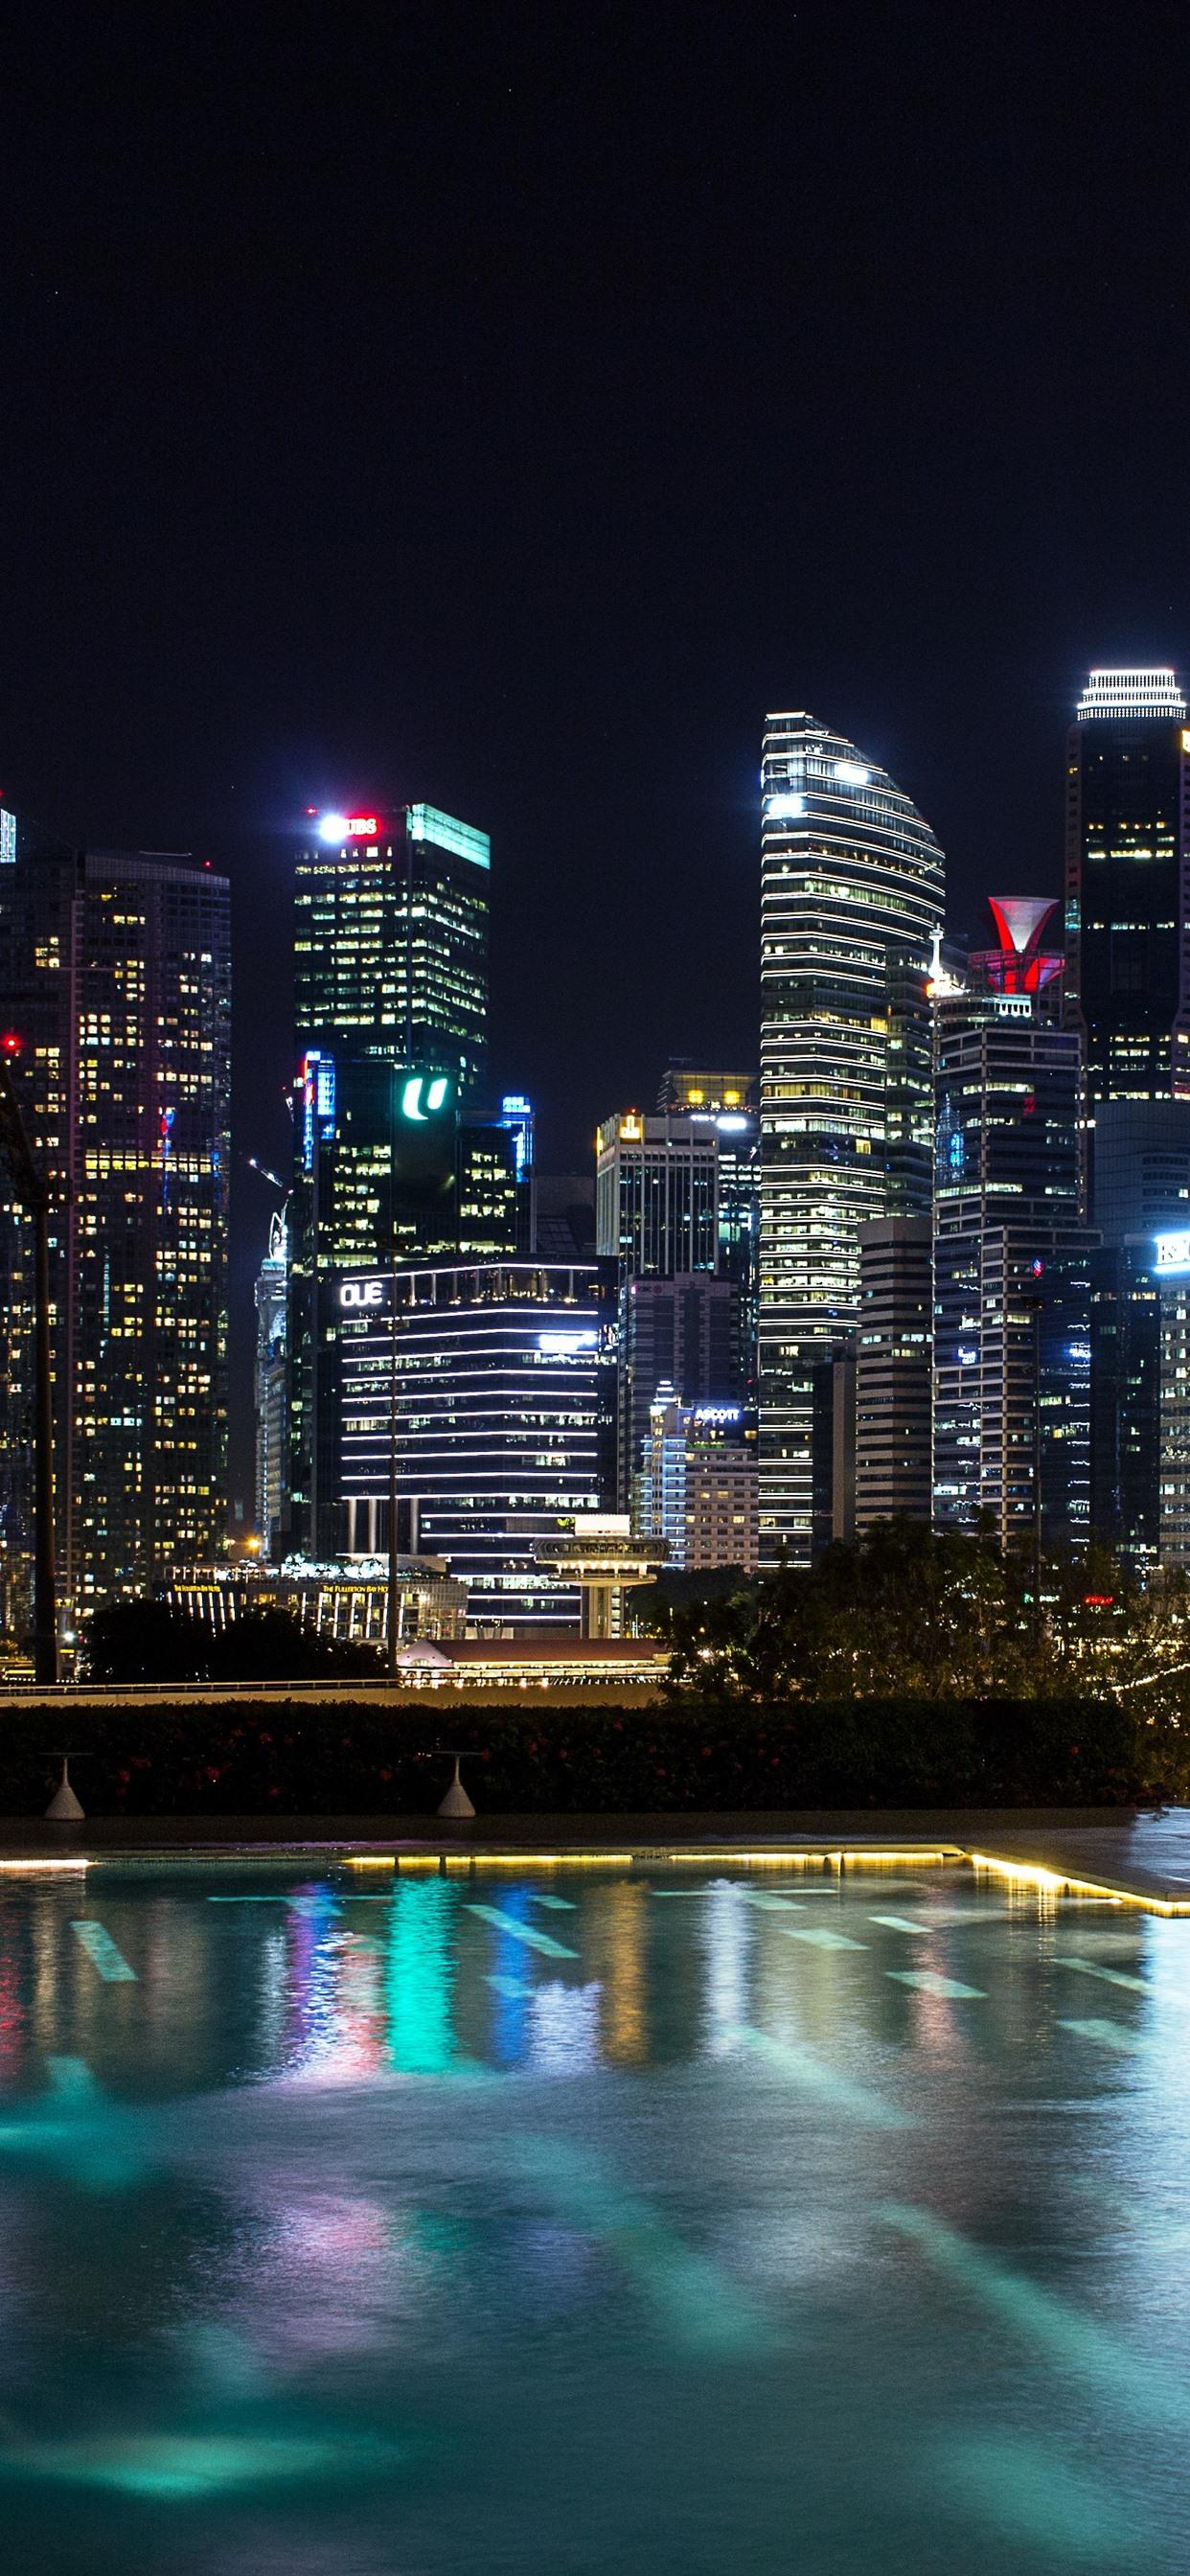 Skyscrapers City Night Lights Singapore 1242x2688 Iphone